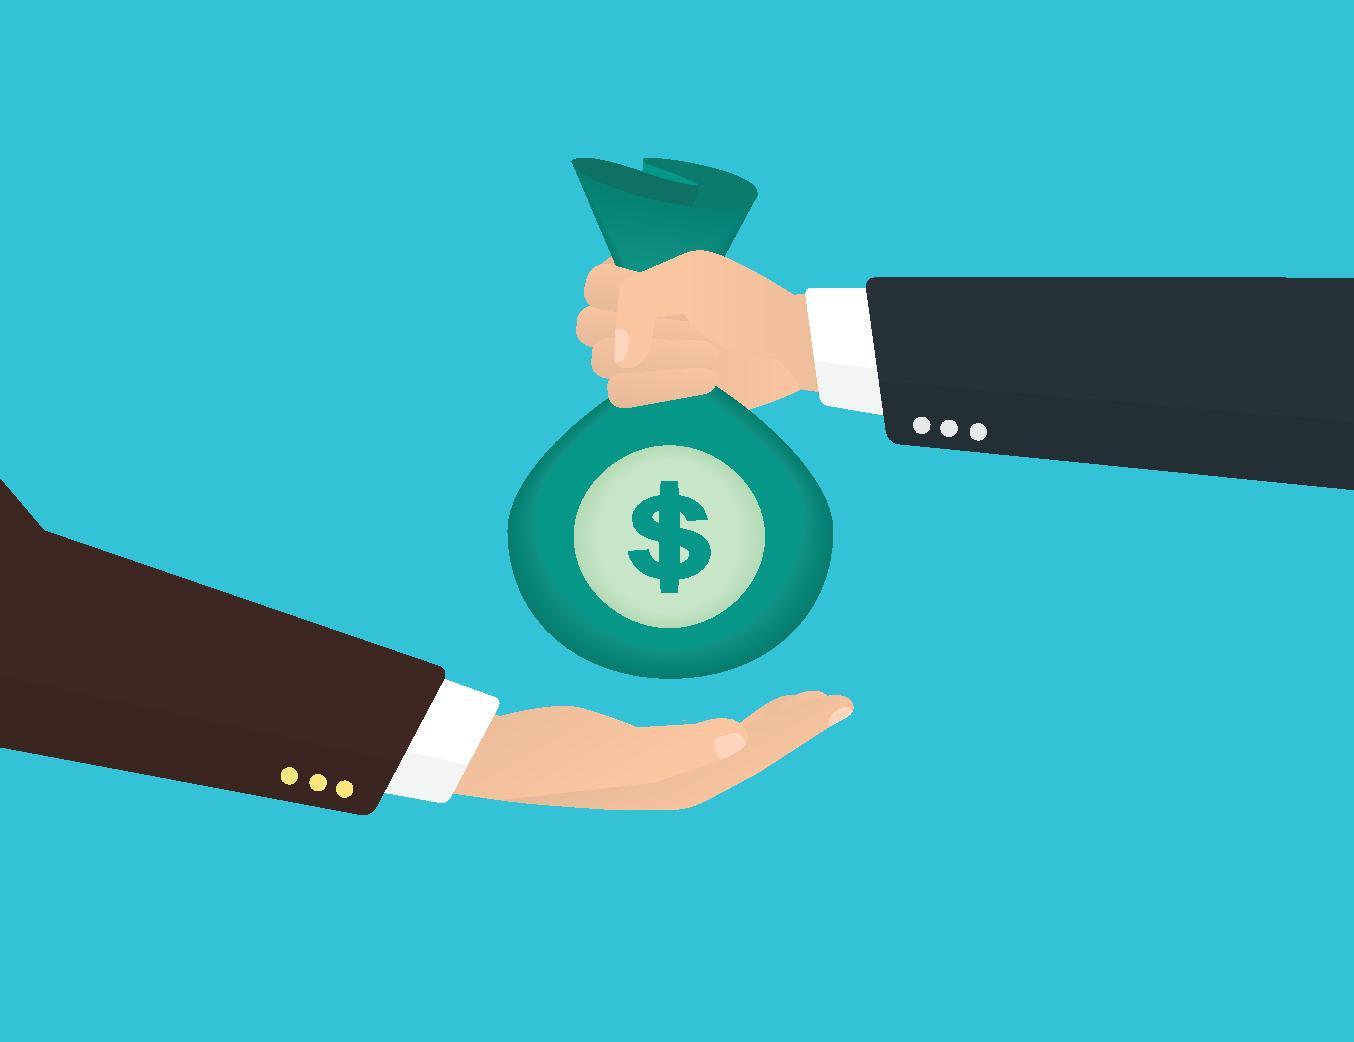 Database admin company Datavail raises $47 million round led by ...